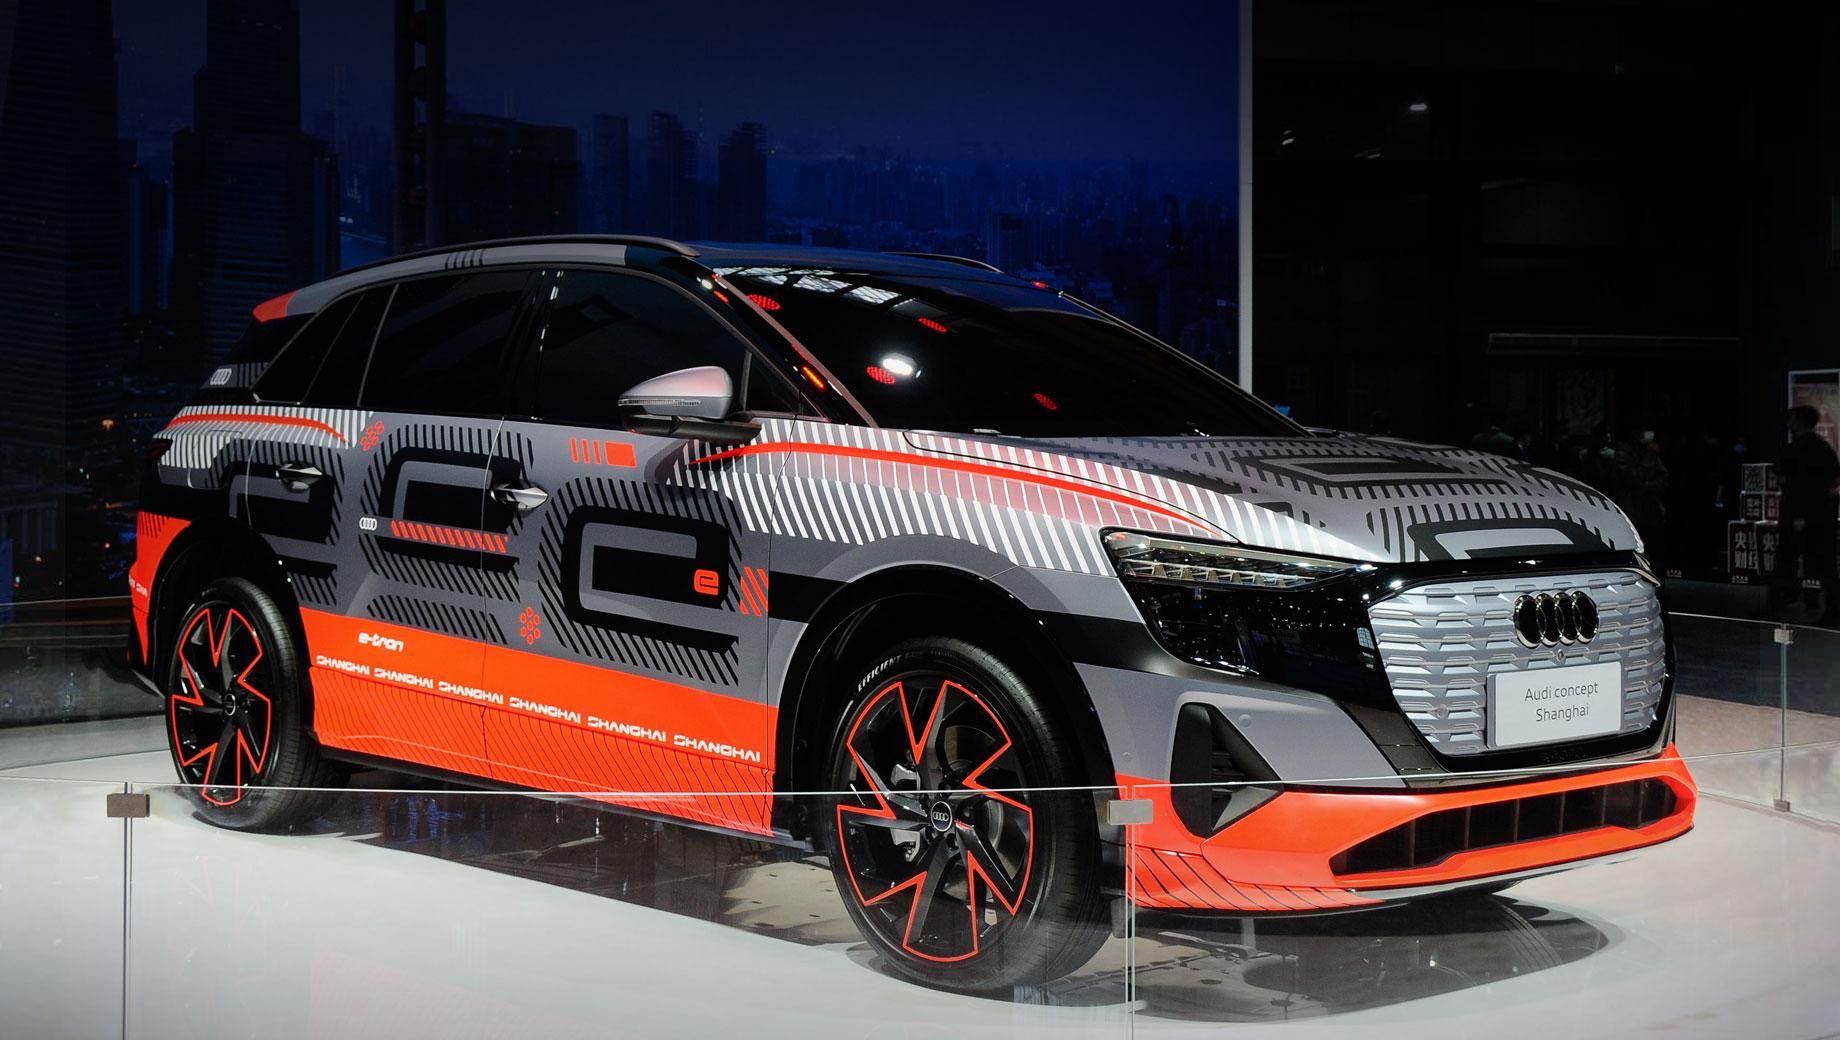 Audi concept Shanghai анонсировал трёхрядный электрокар